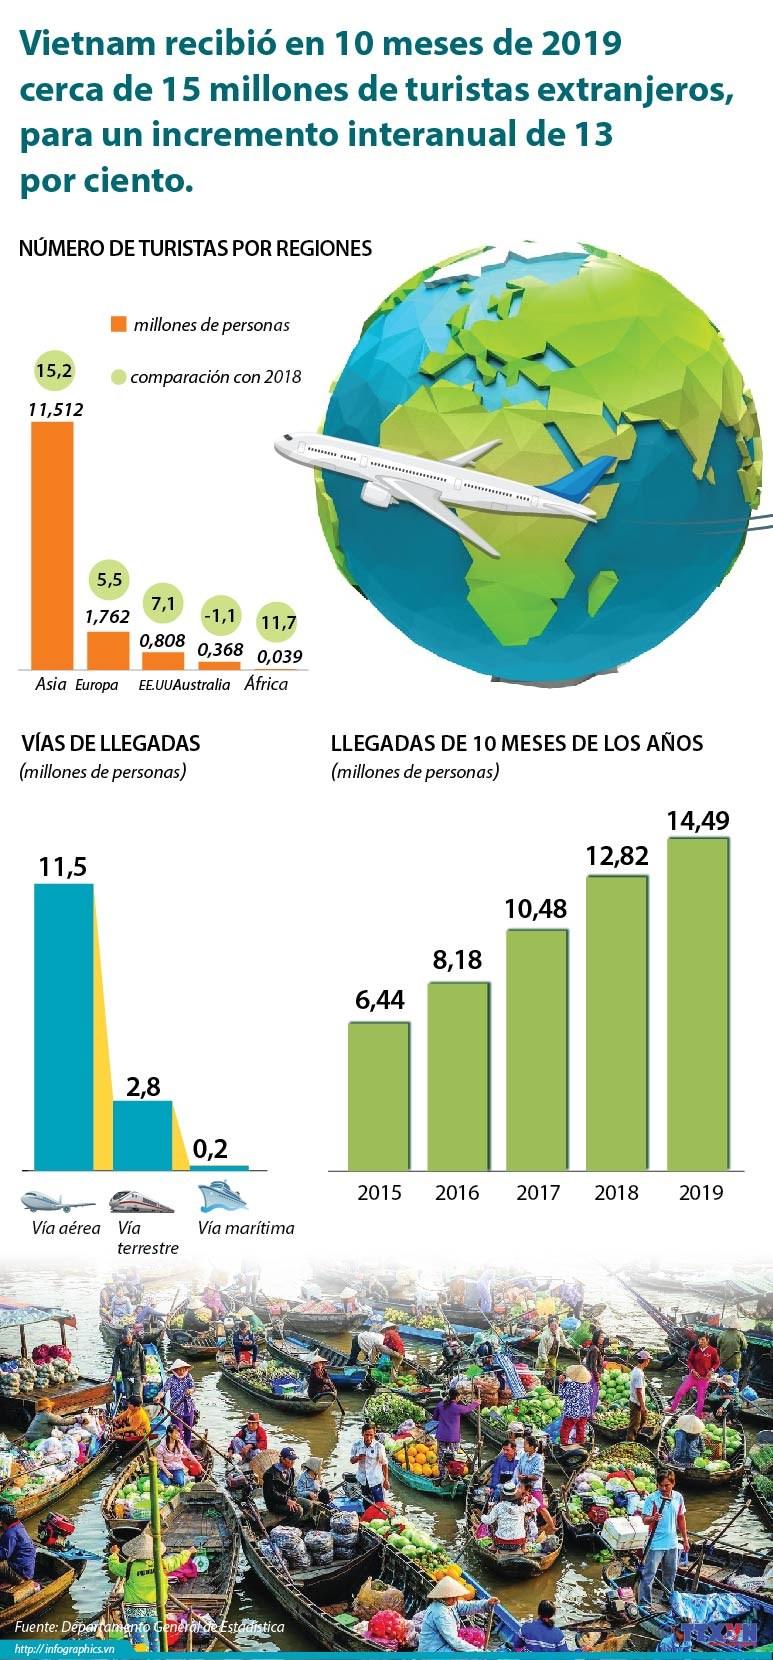 [Info] Vietnam recibe en 10 meses cerca de 15 millones de turistas extranjeros hinh anh 1